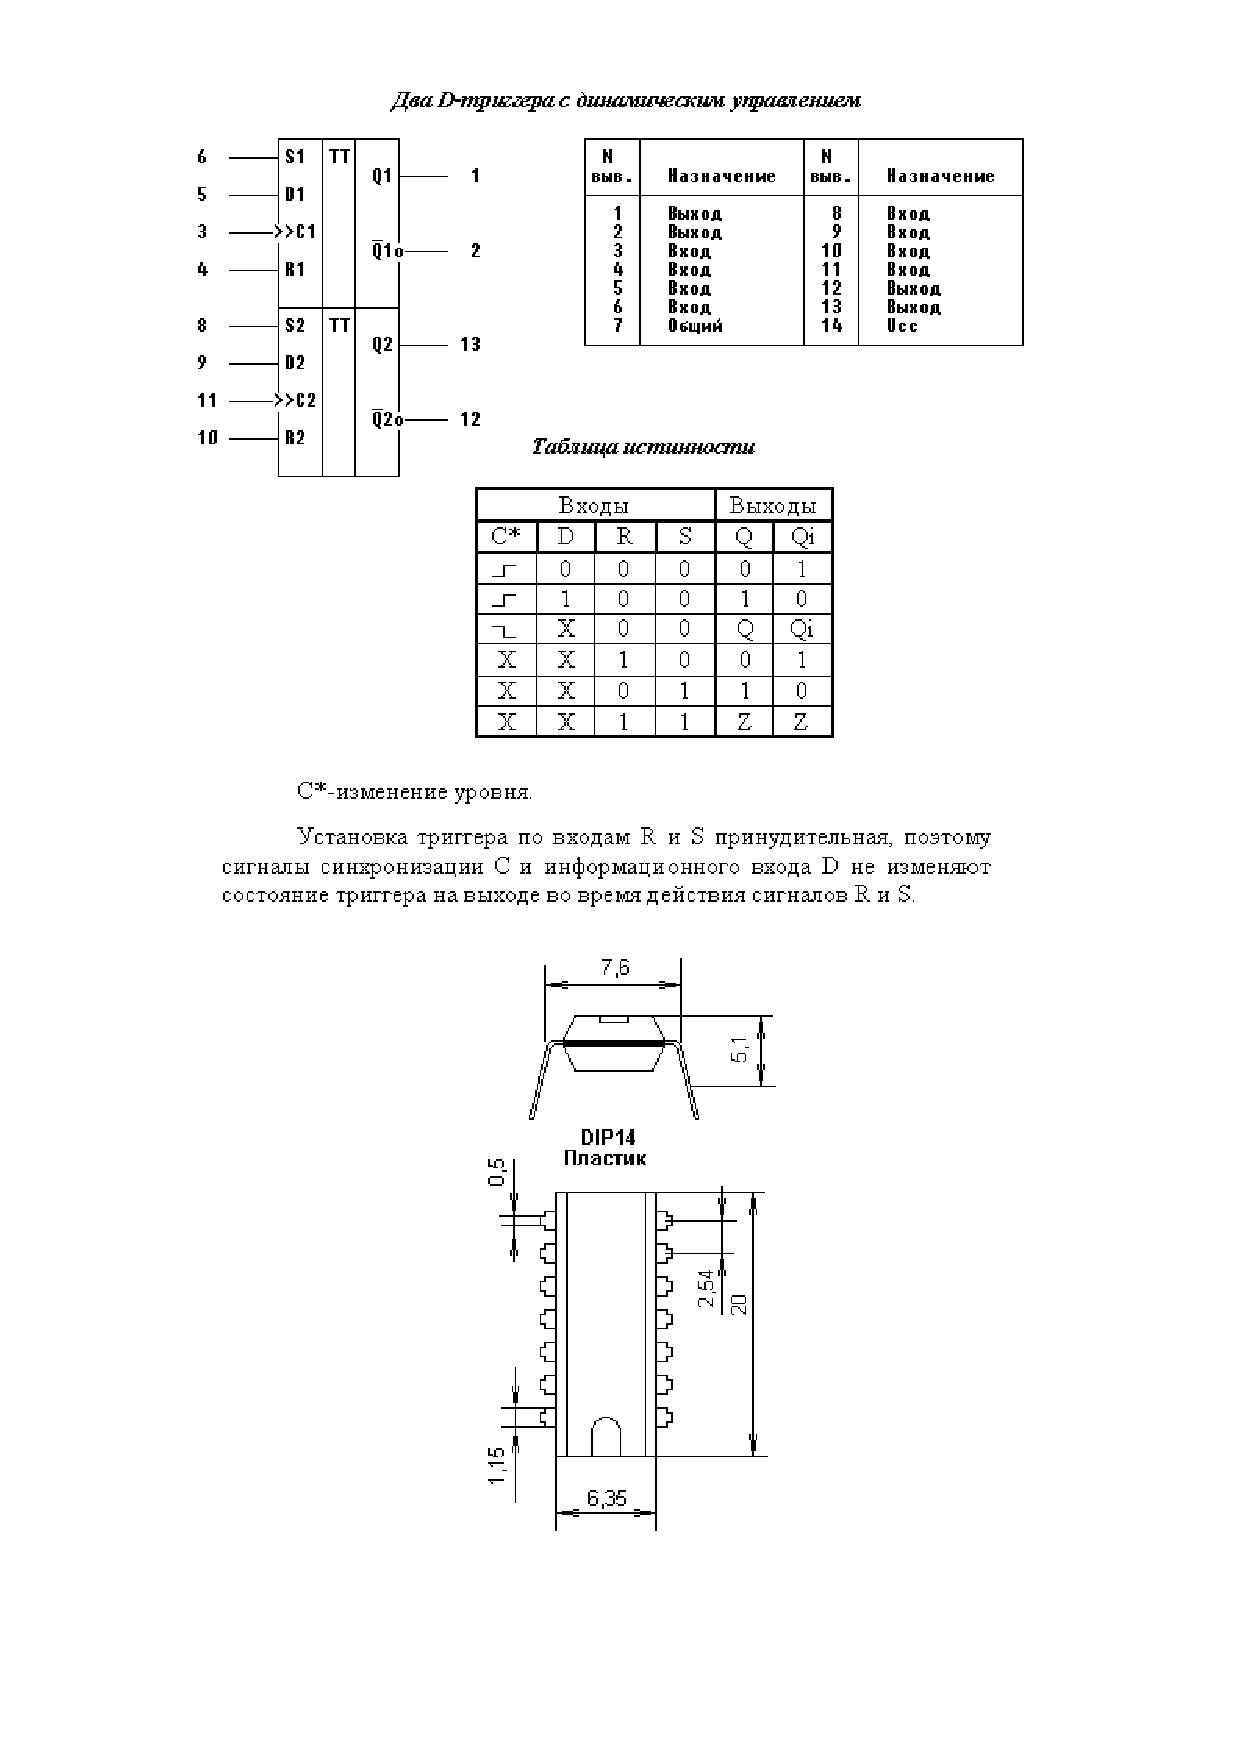 K564 datasheet